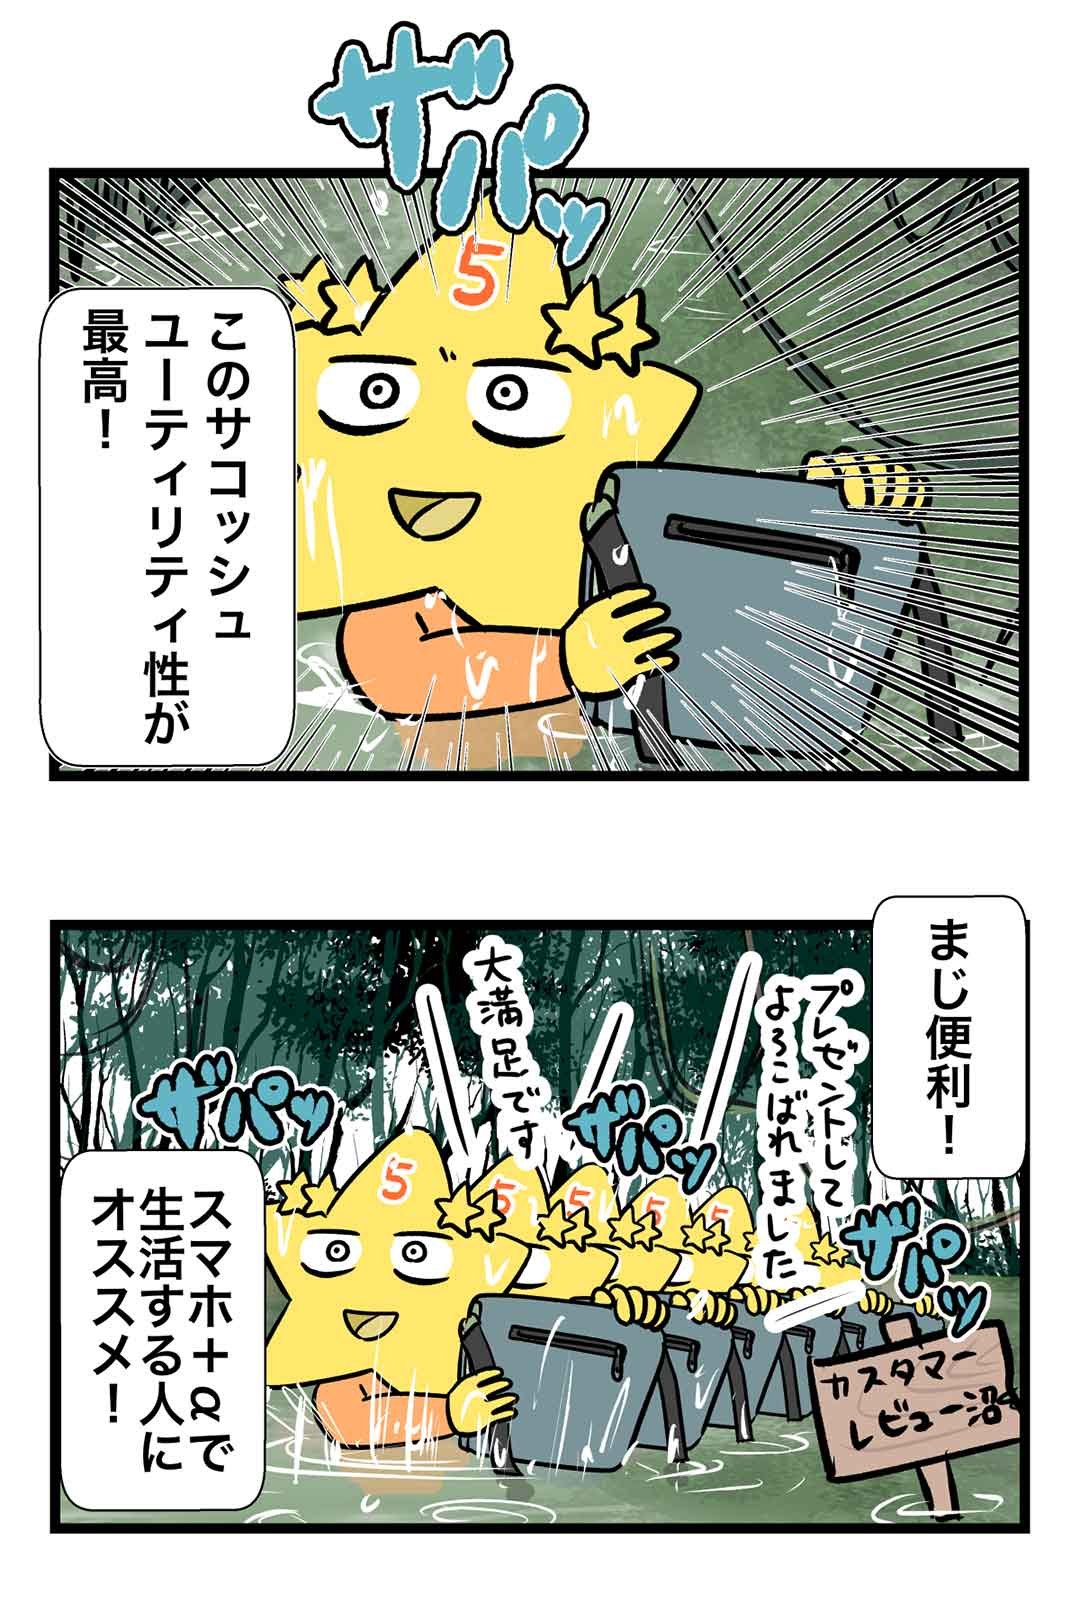 Amazon★1がレビュー沼に沈む物語